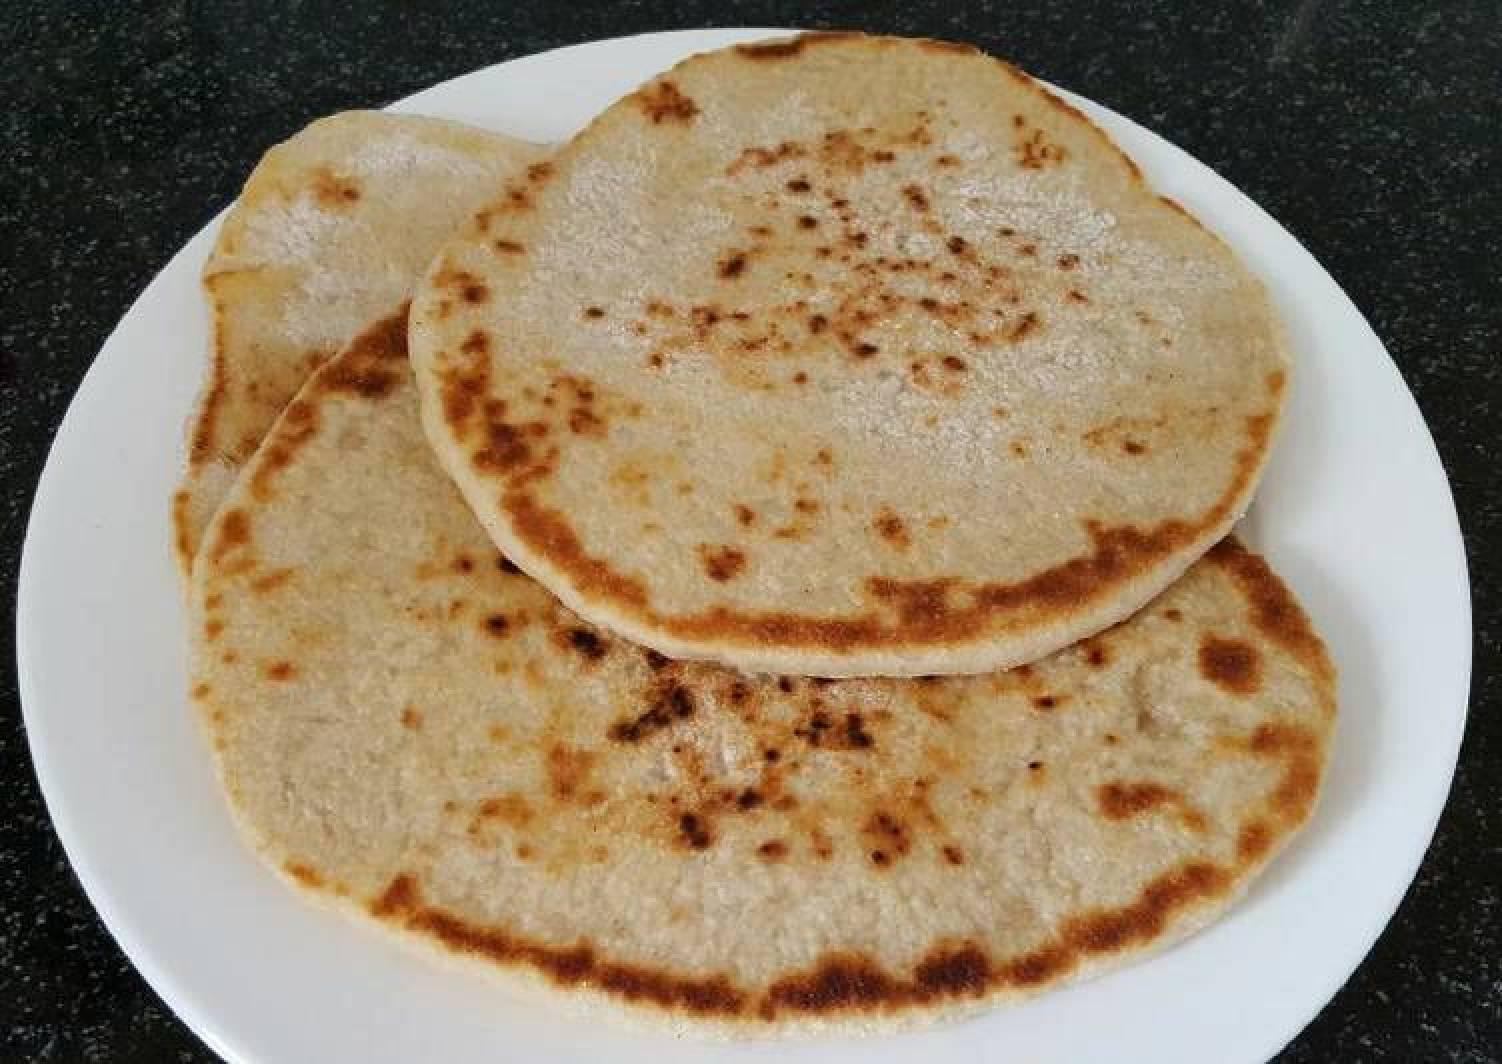 Sourdough Flat bread baked in the pan